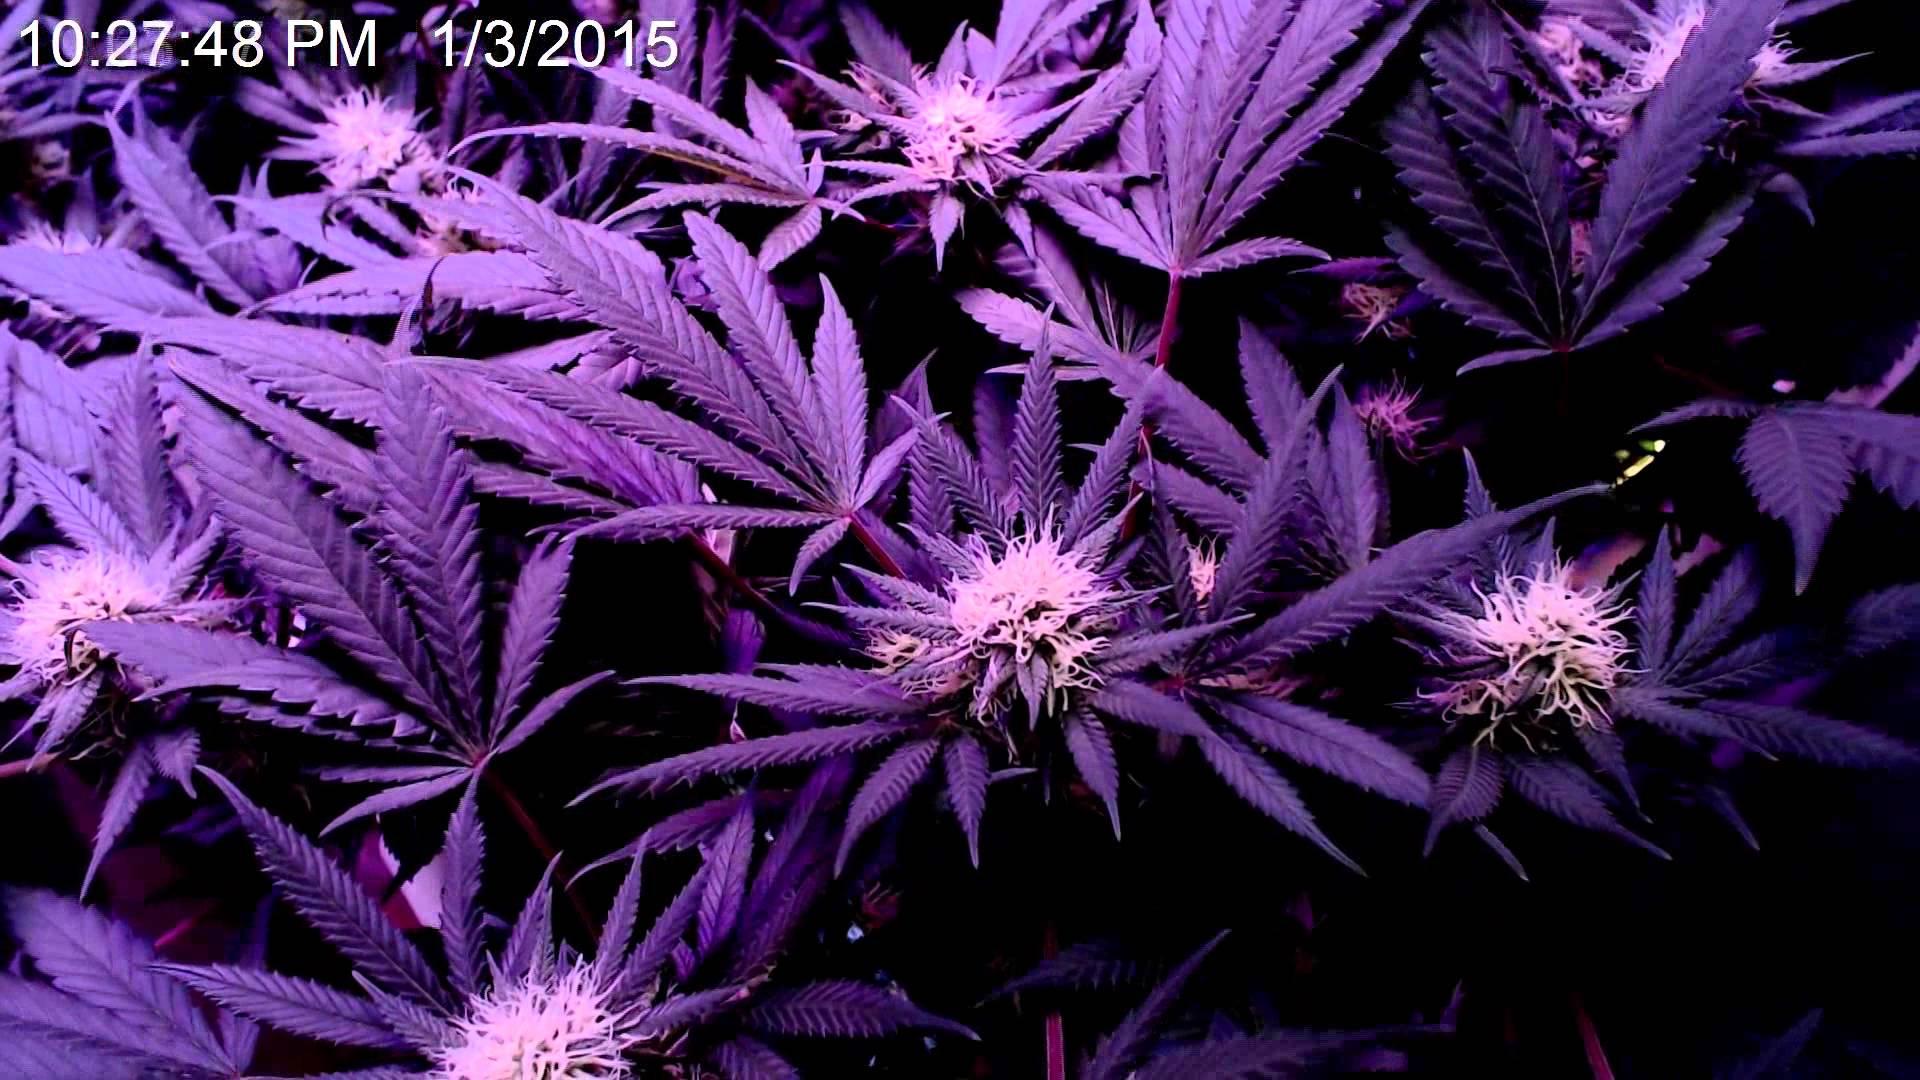 marijuana timelapse closeup of flower forming 60 days cannabis